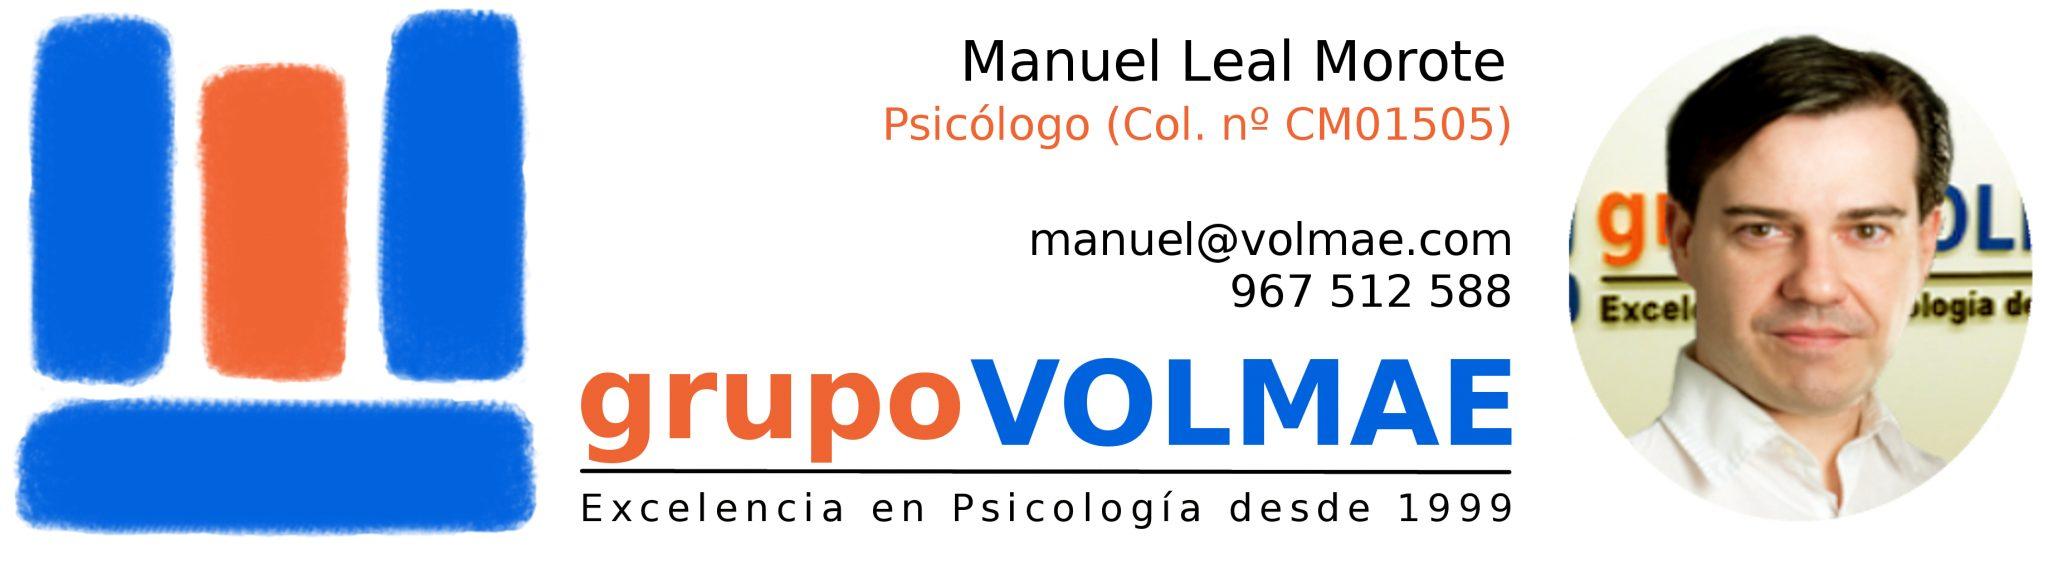 Manuel Leal - General 2